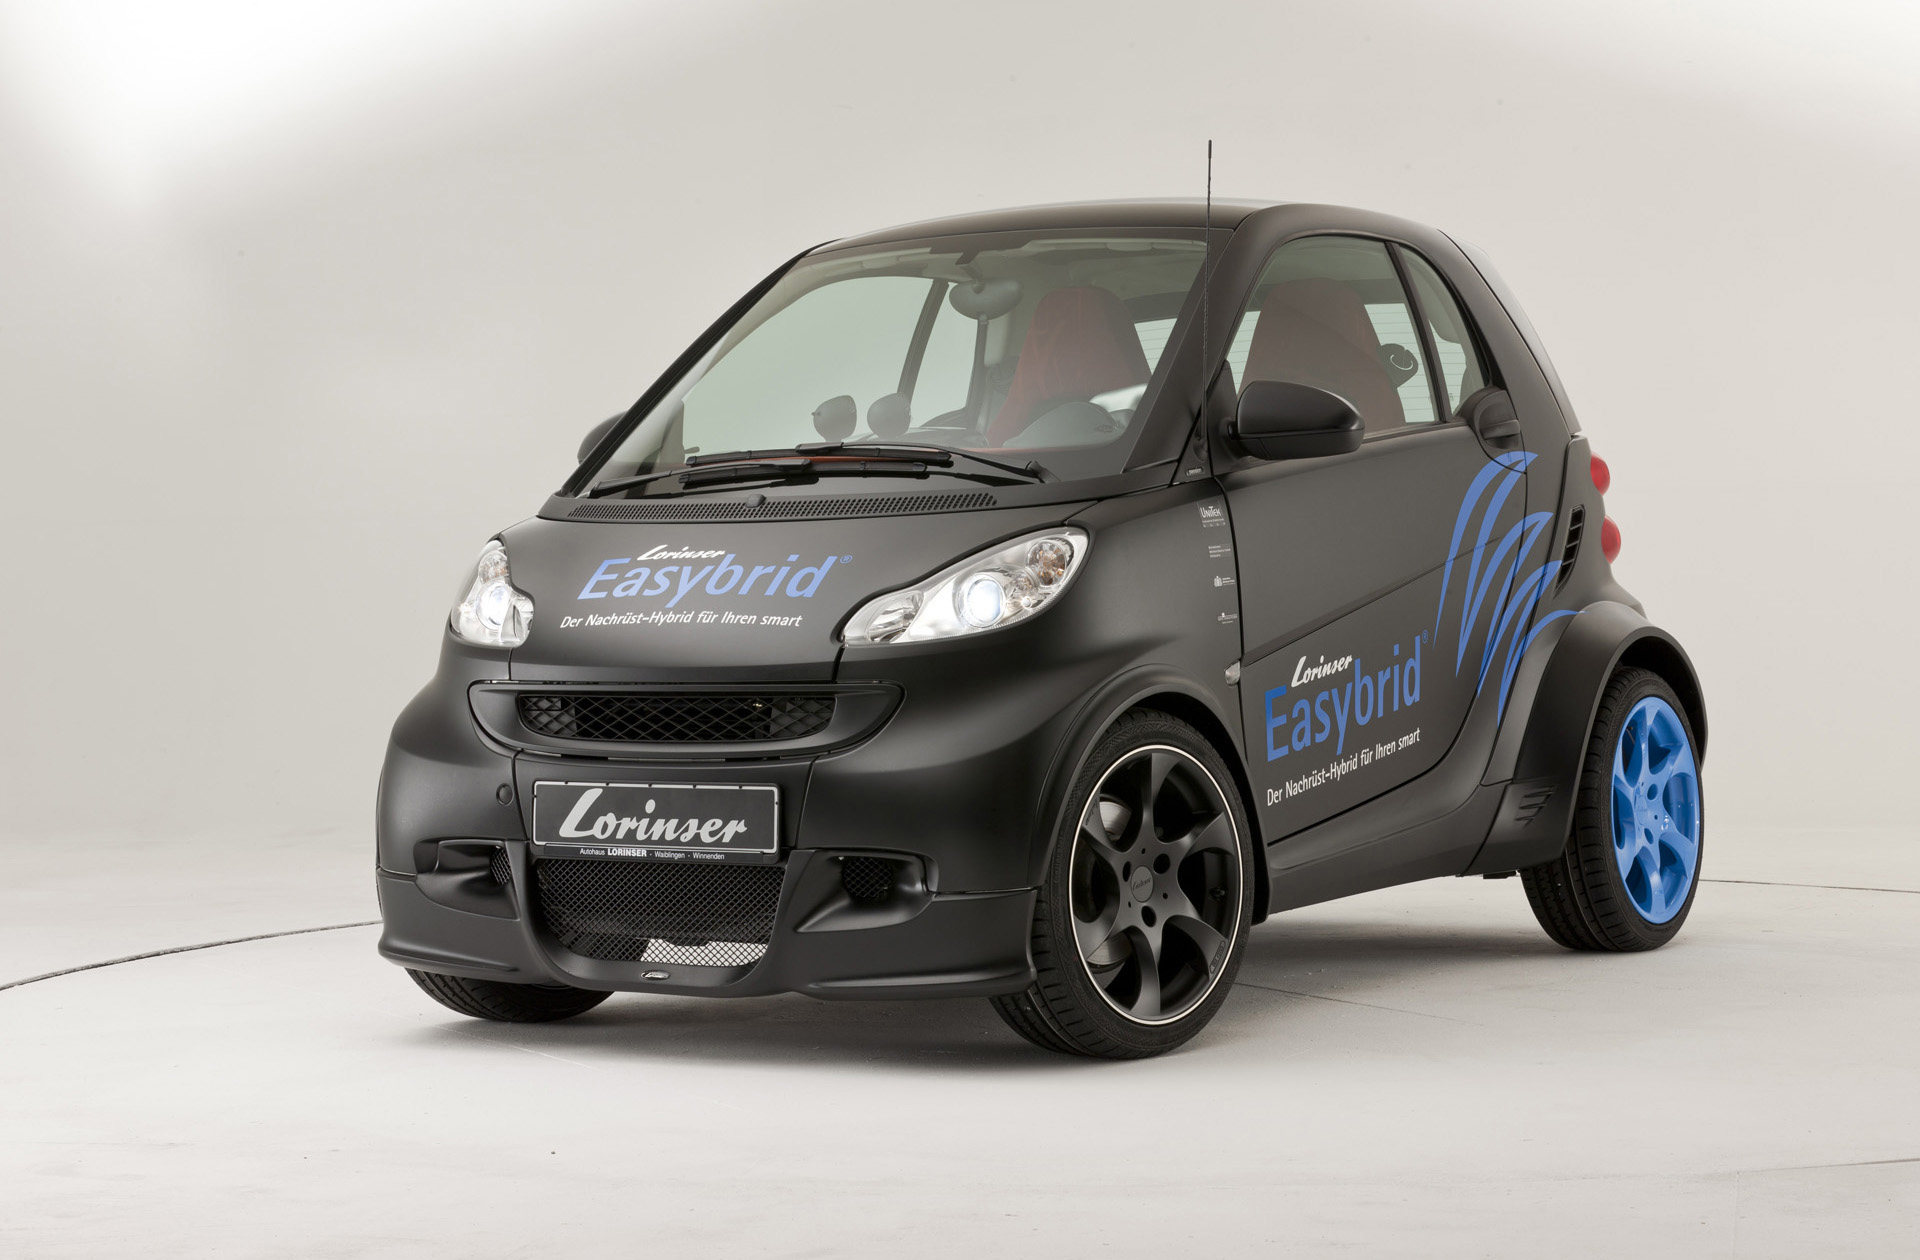 Lorinser Smart ForTwo Easybrid photo #1